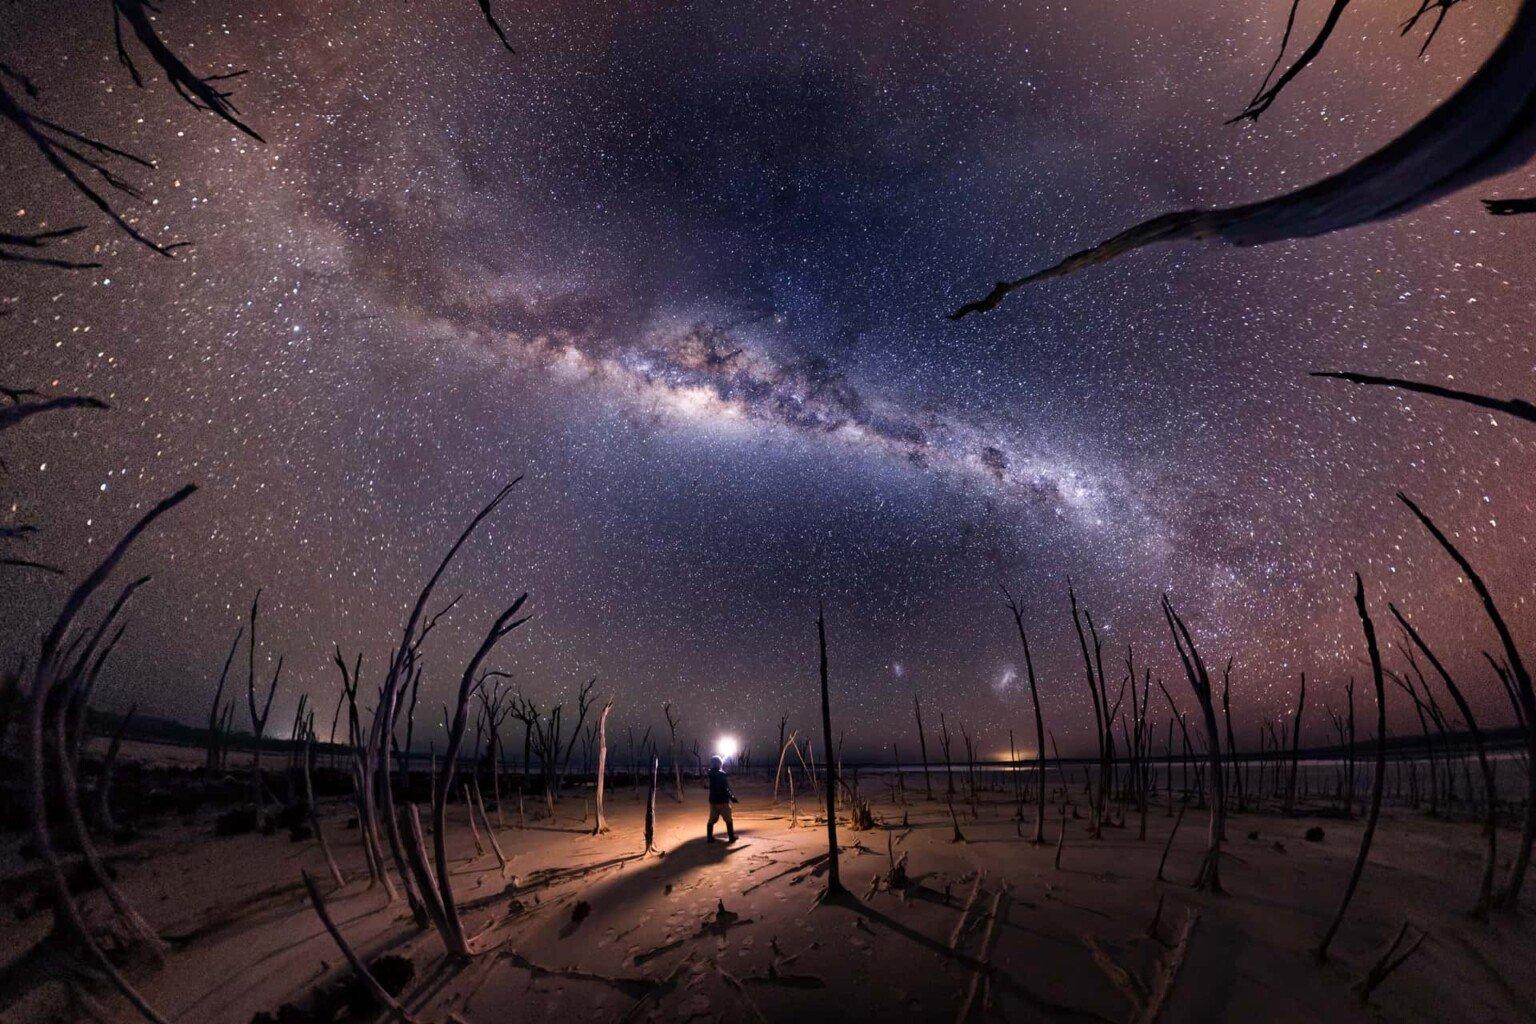 Best-Milky-Way-shot-fish-eye-1536×1024